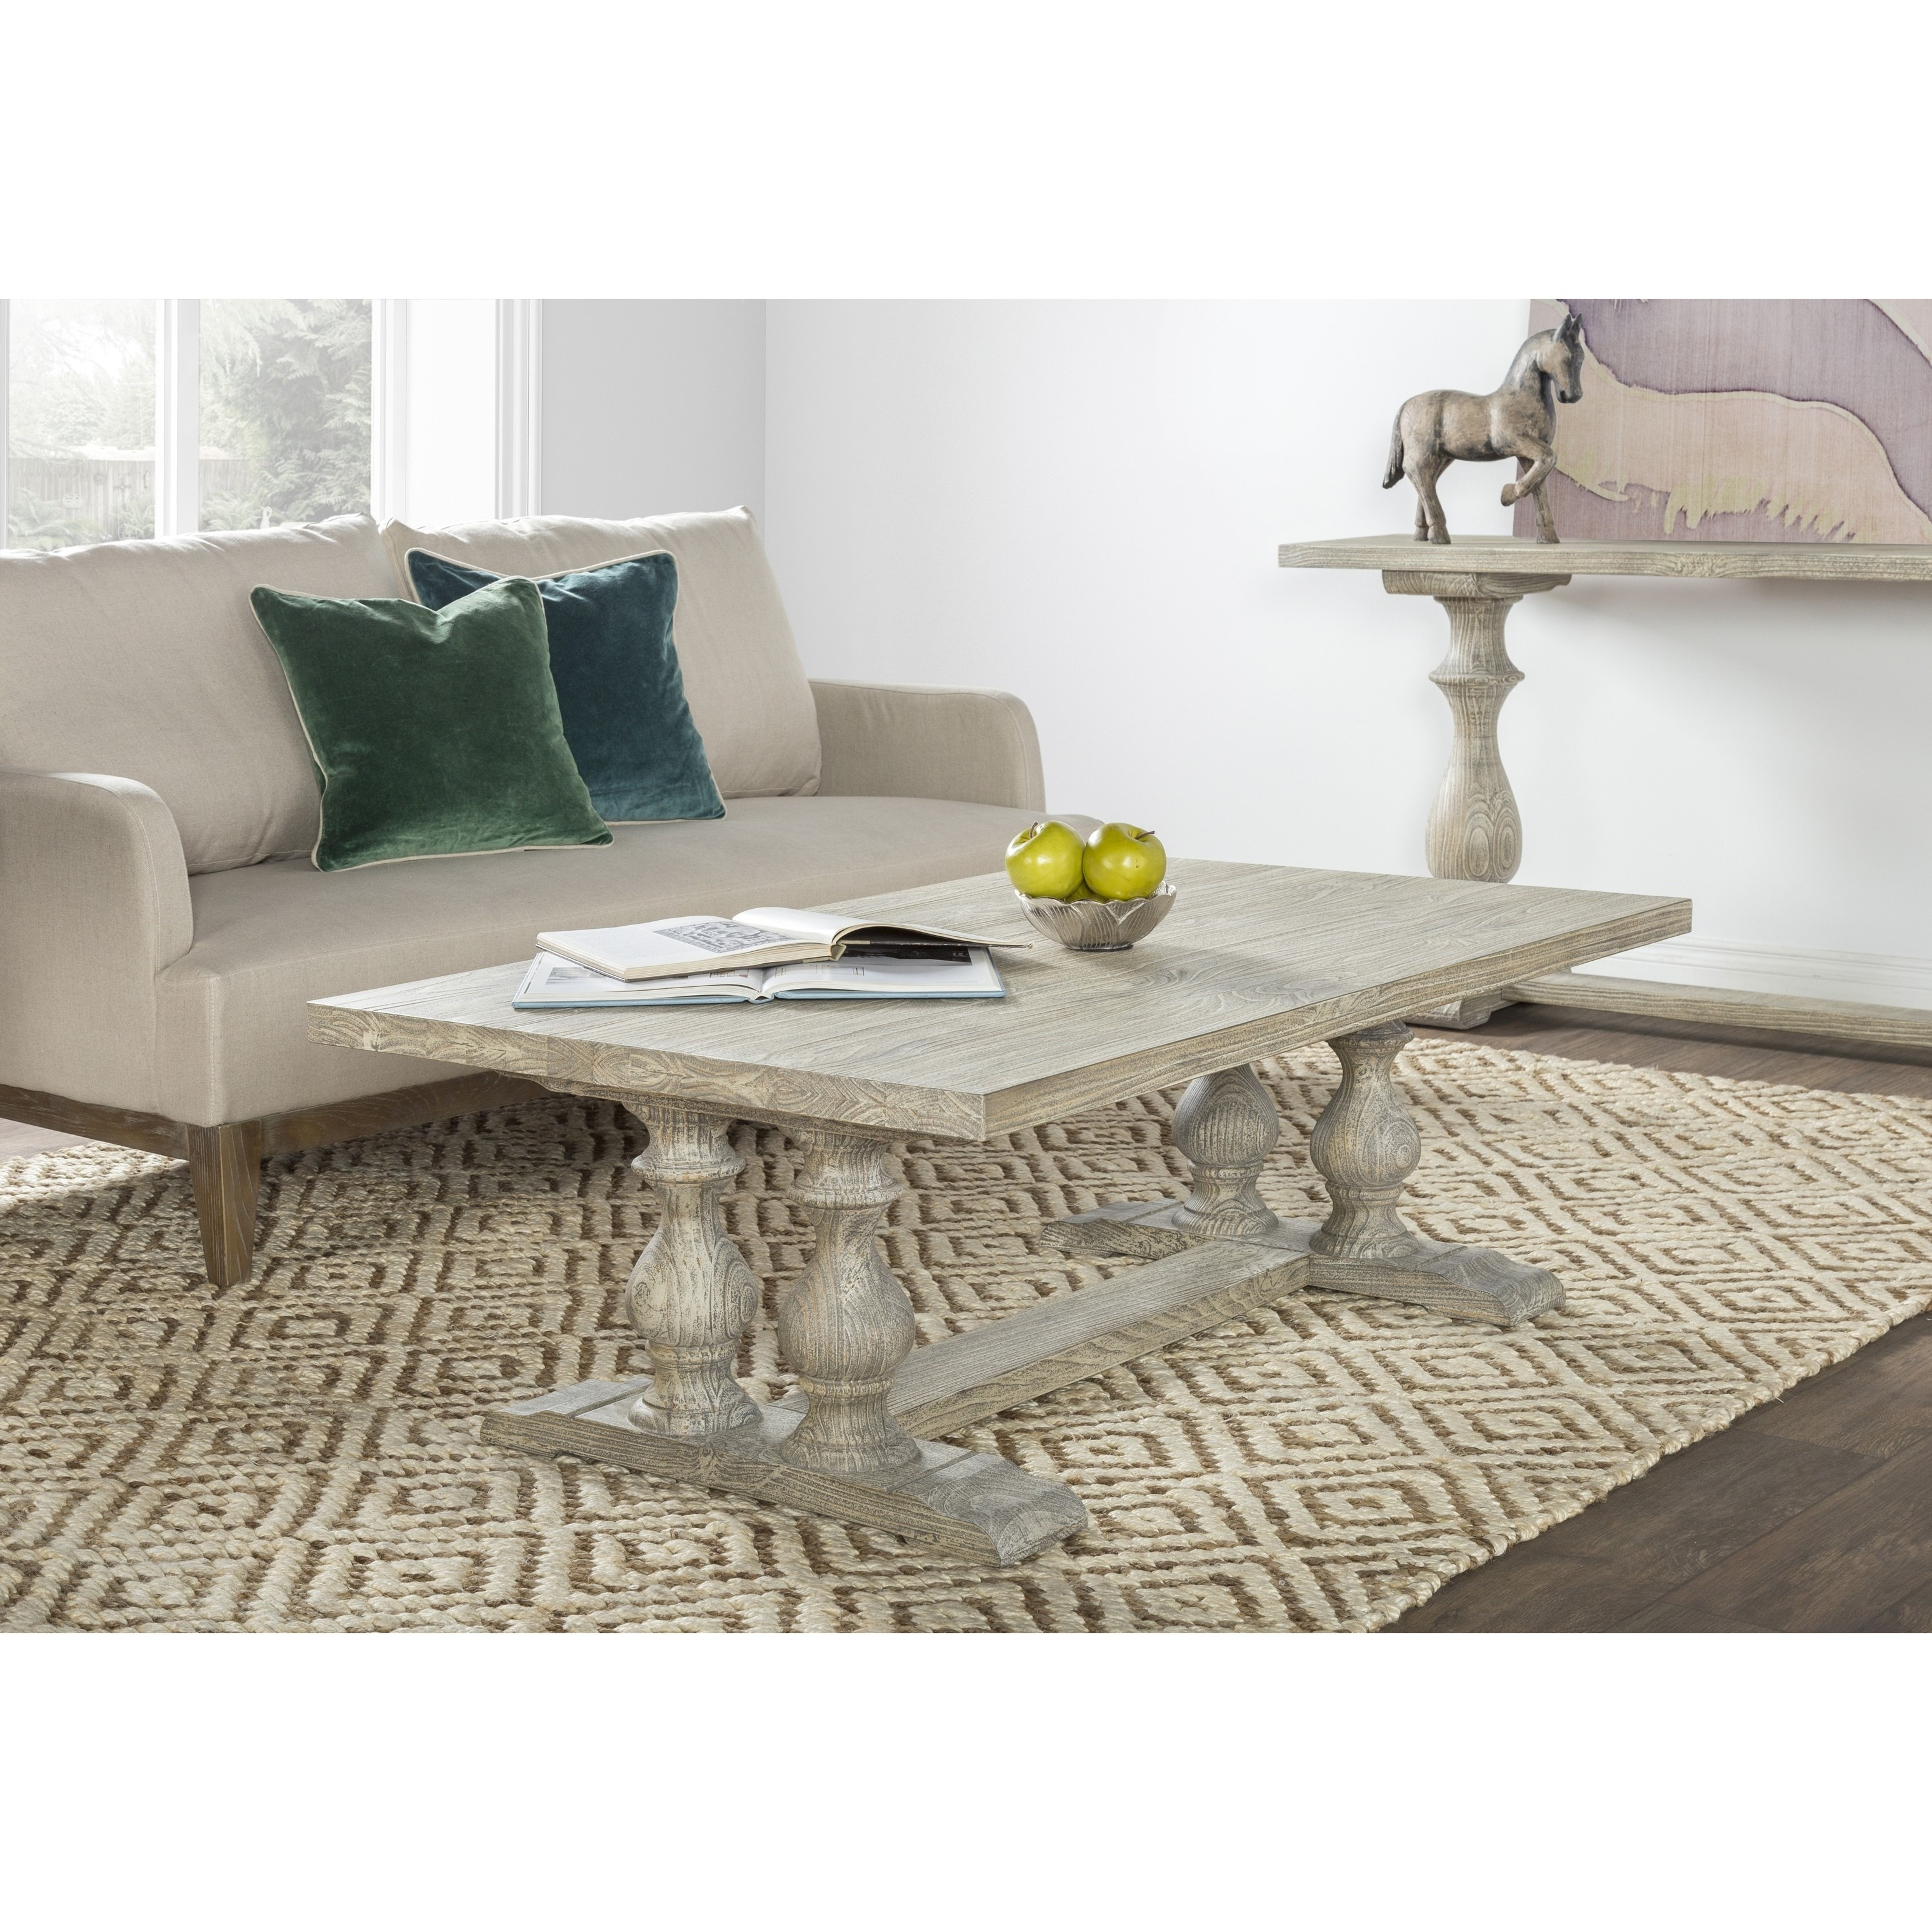 Wakefield Rustic Grey Reclaimed Pine Rectangular Coffee Table by